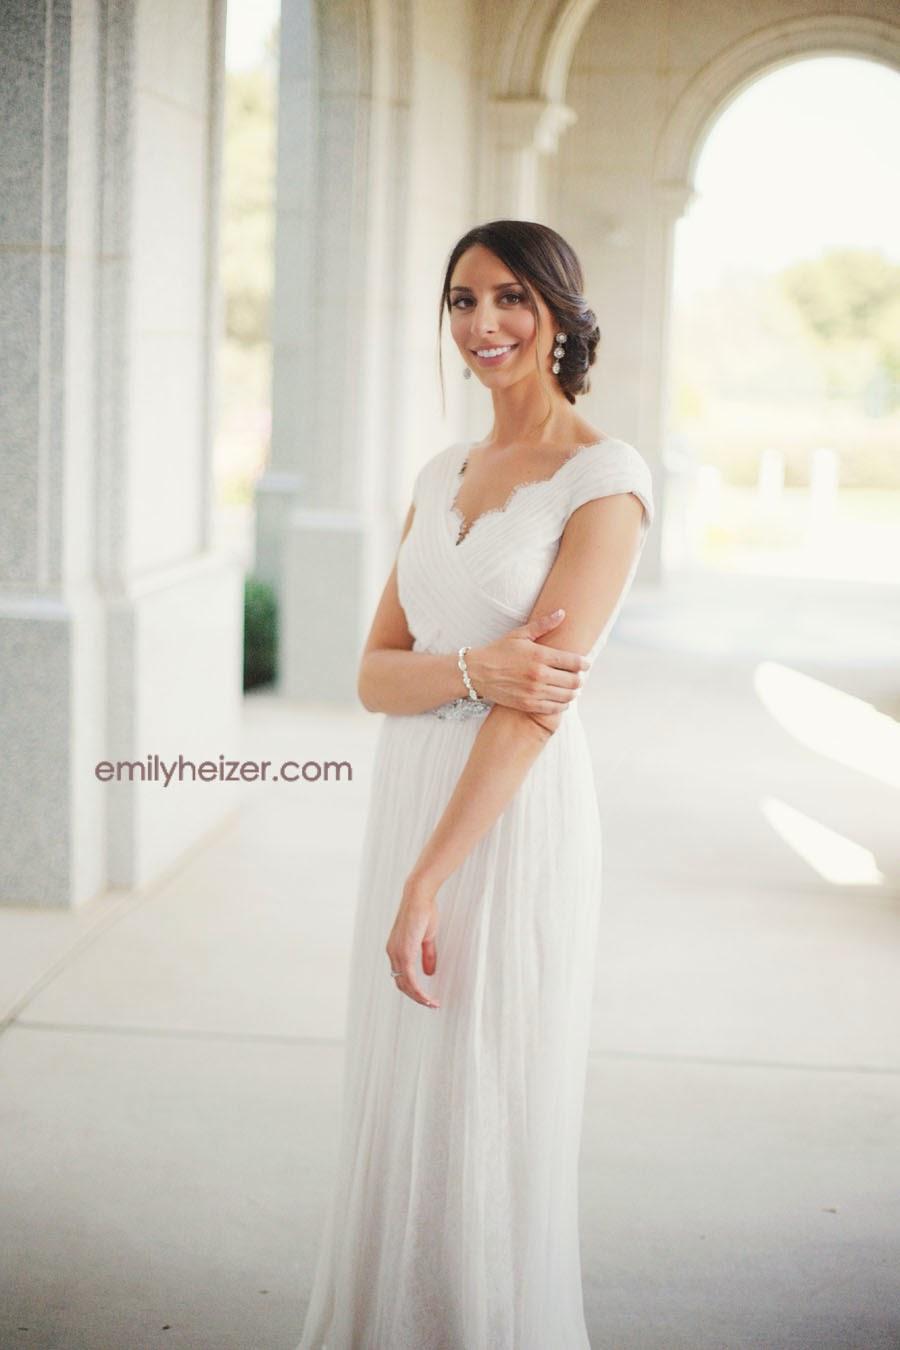 Modest Lds Wedding Dresses 14 Fabulous Sacramento LDS Temple Wedding